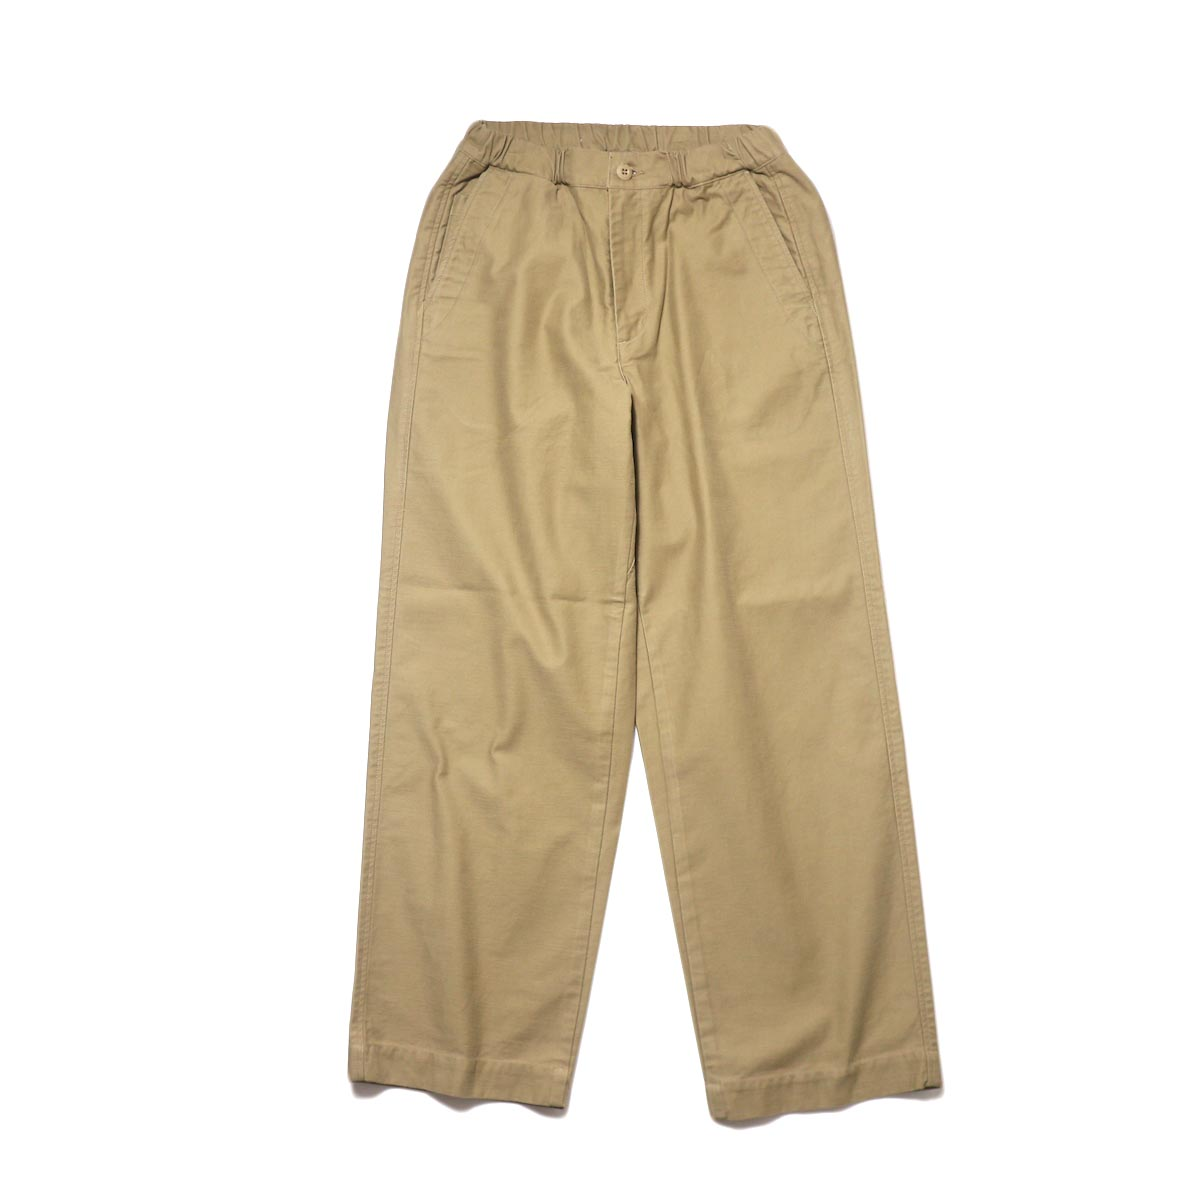 BRENA / Coq Pants (beige) 正面